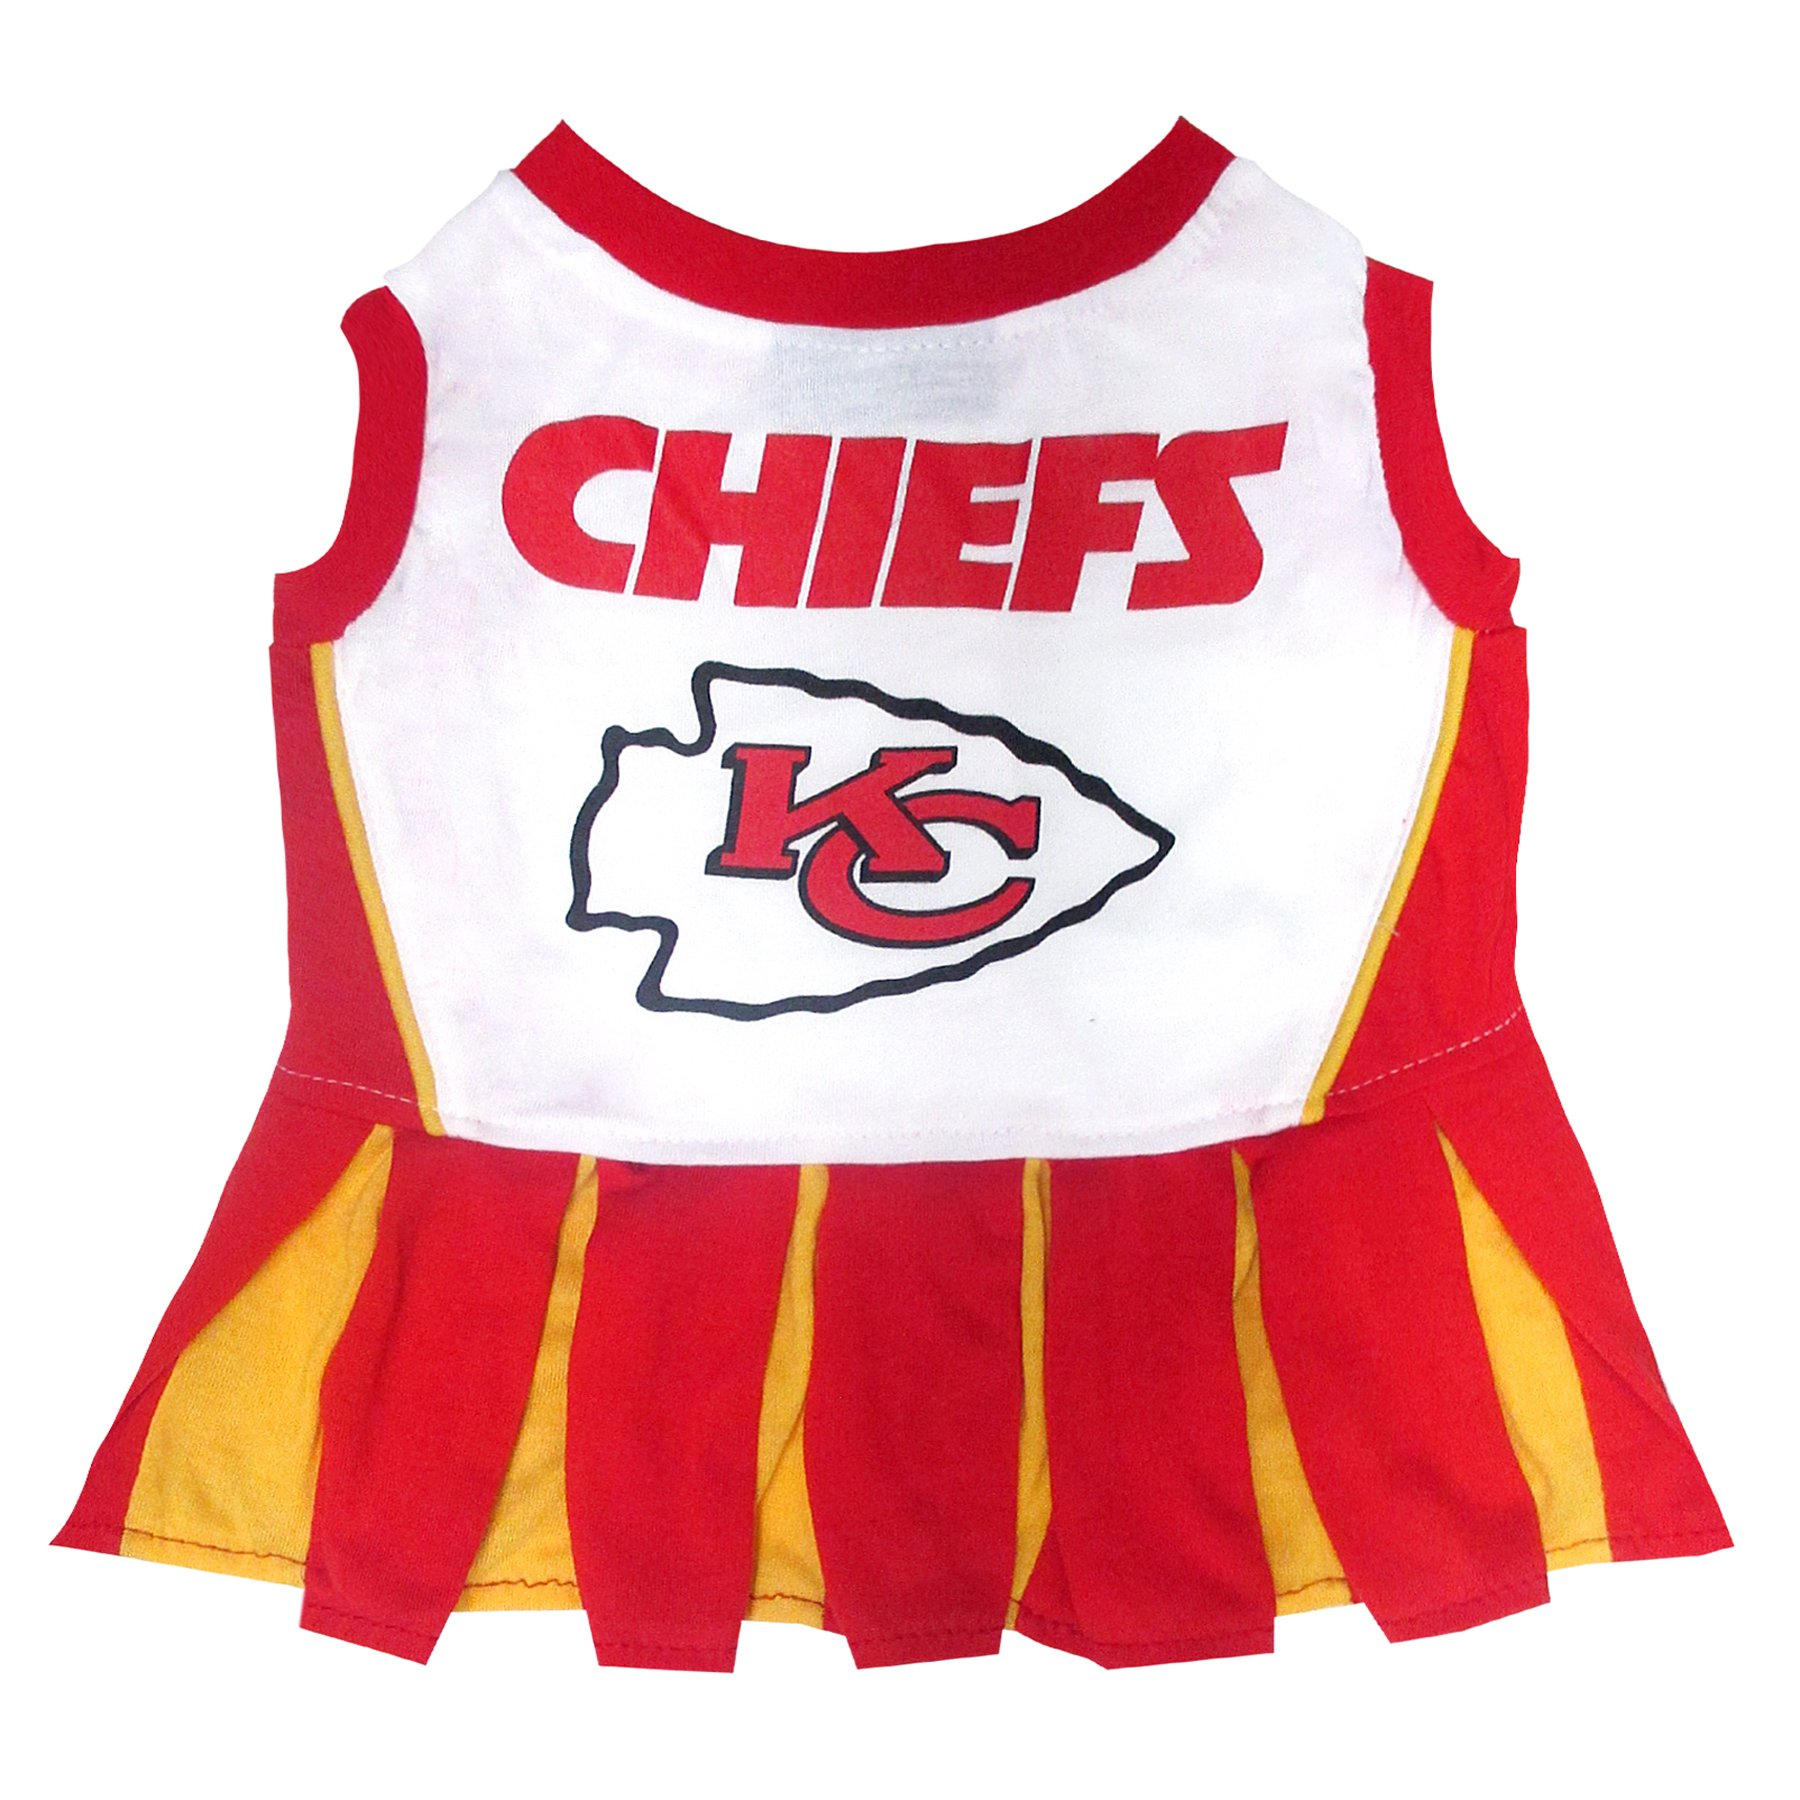 Kansas City Chiefs NFL Cheerleader Dress For Dogs - Size Medium